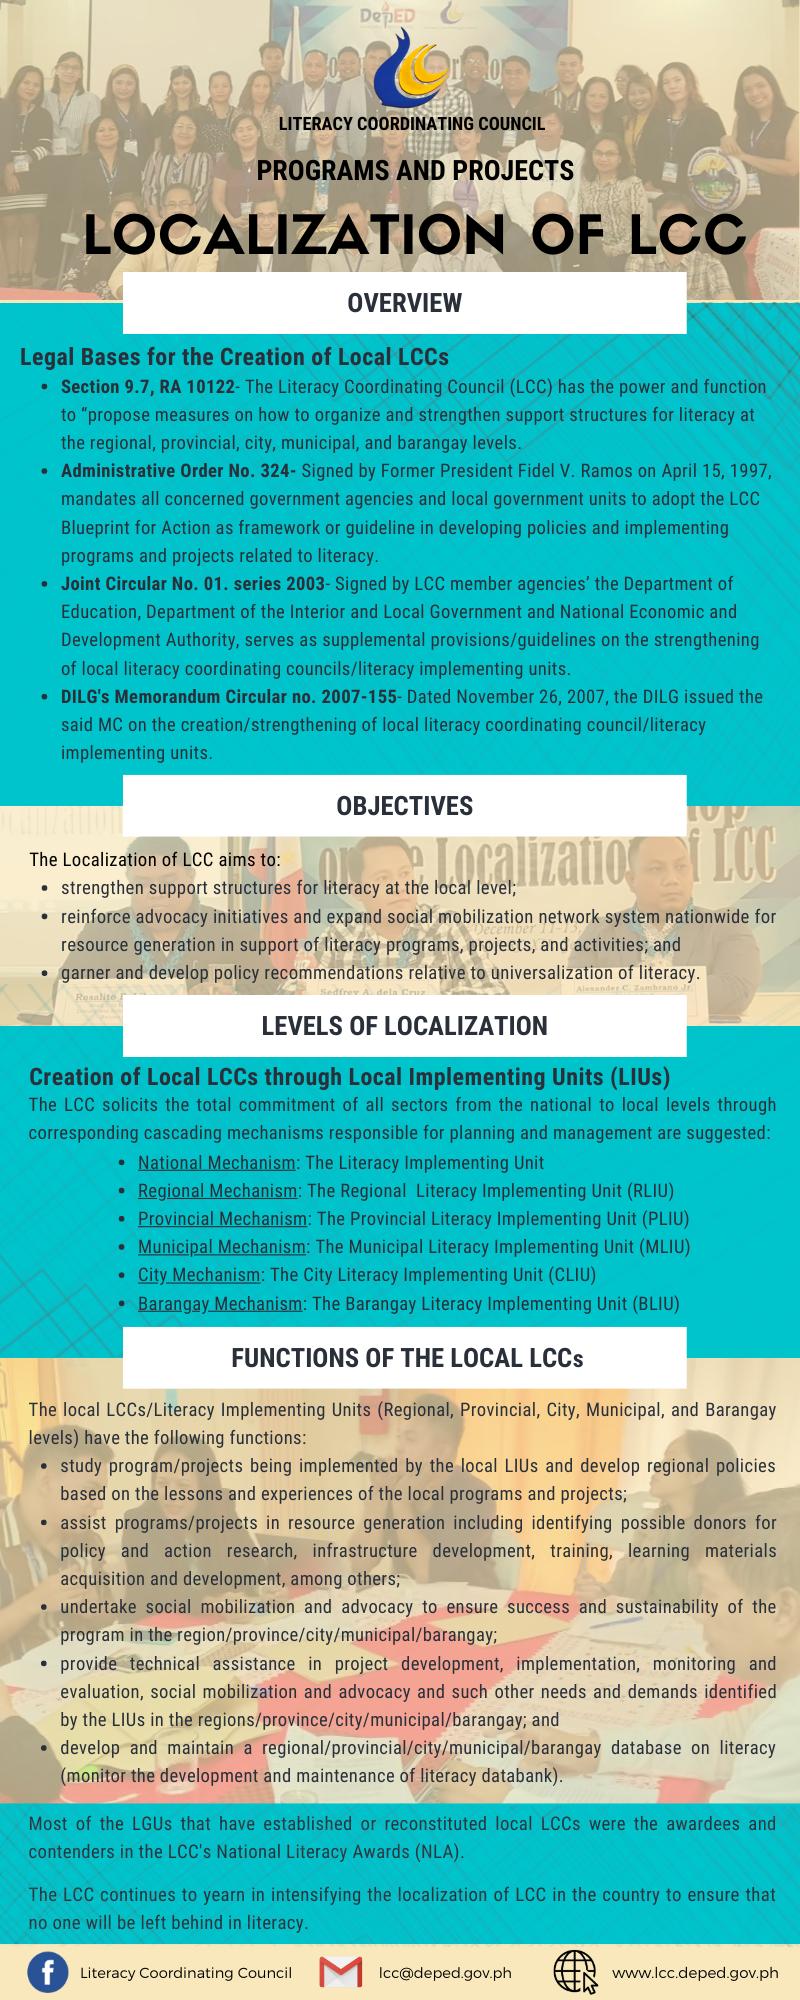 LCC Localization